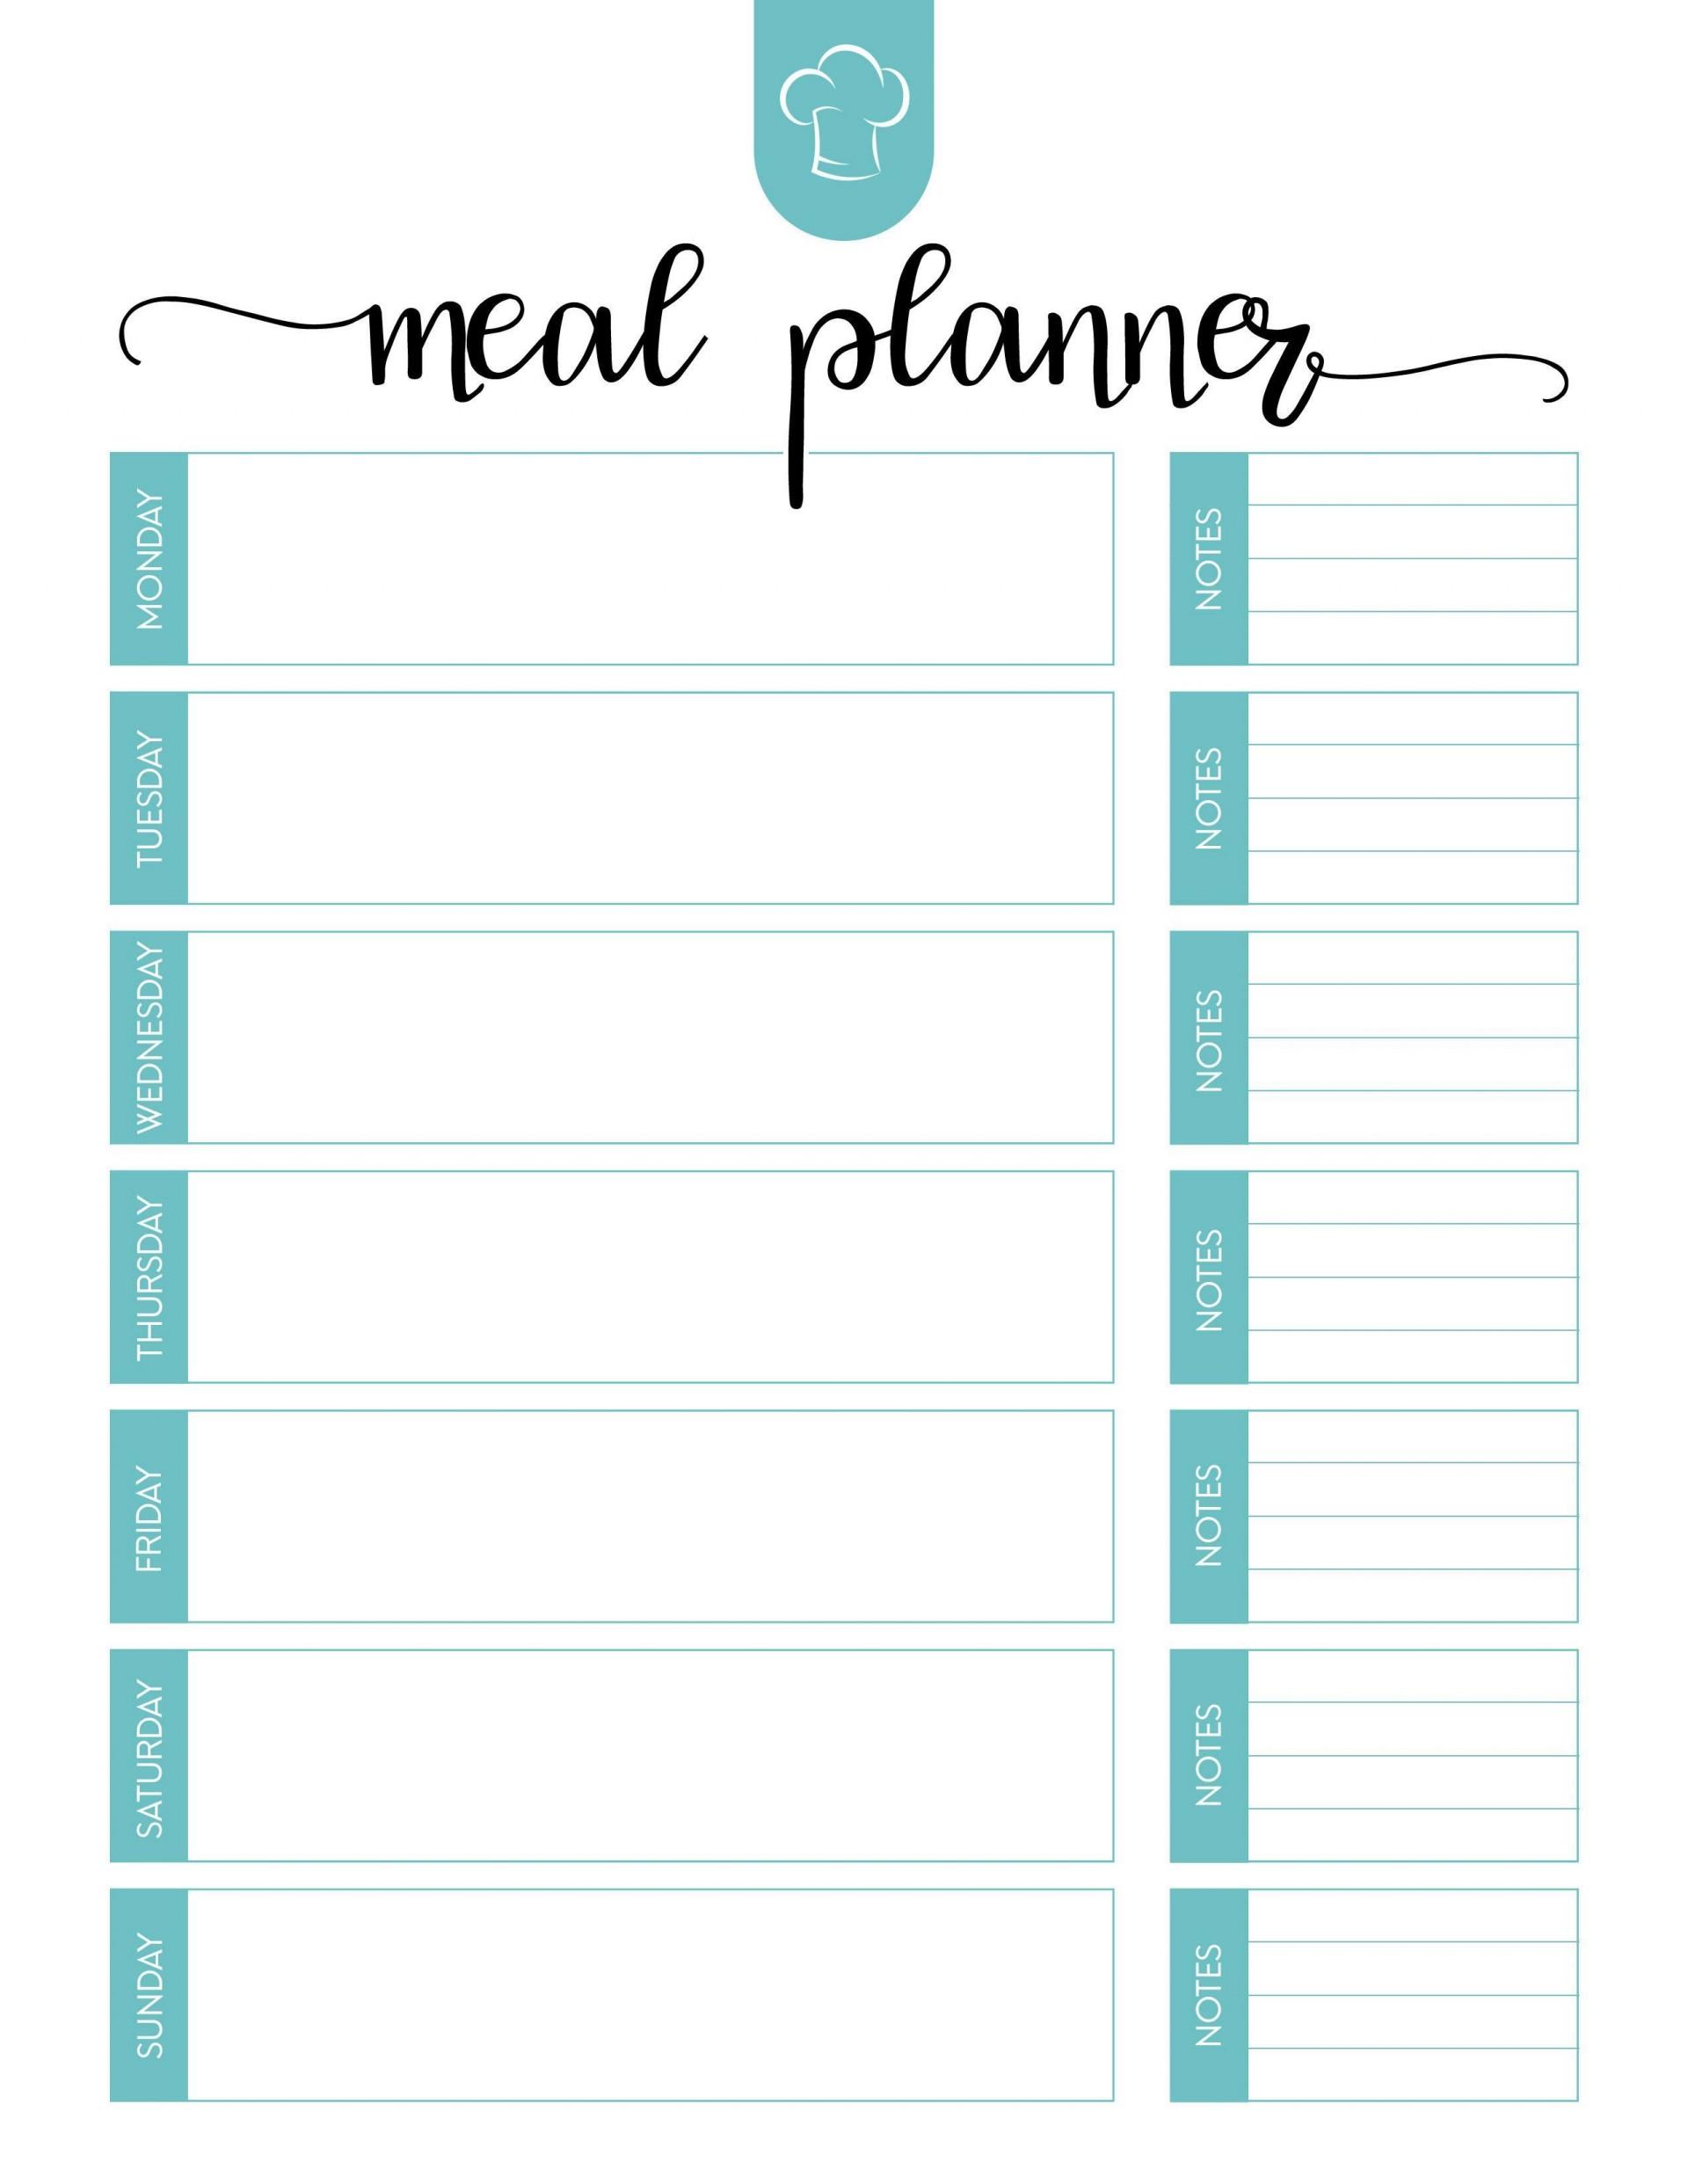 000 Best Weekly Meal Planning Worksheet Pdf High Resolution  Free1920